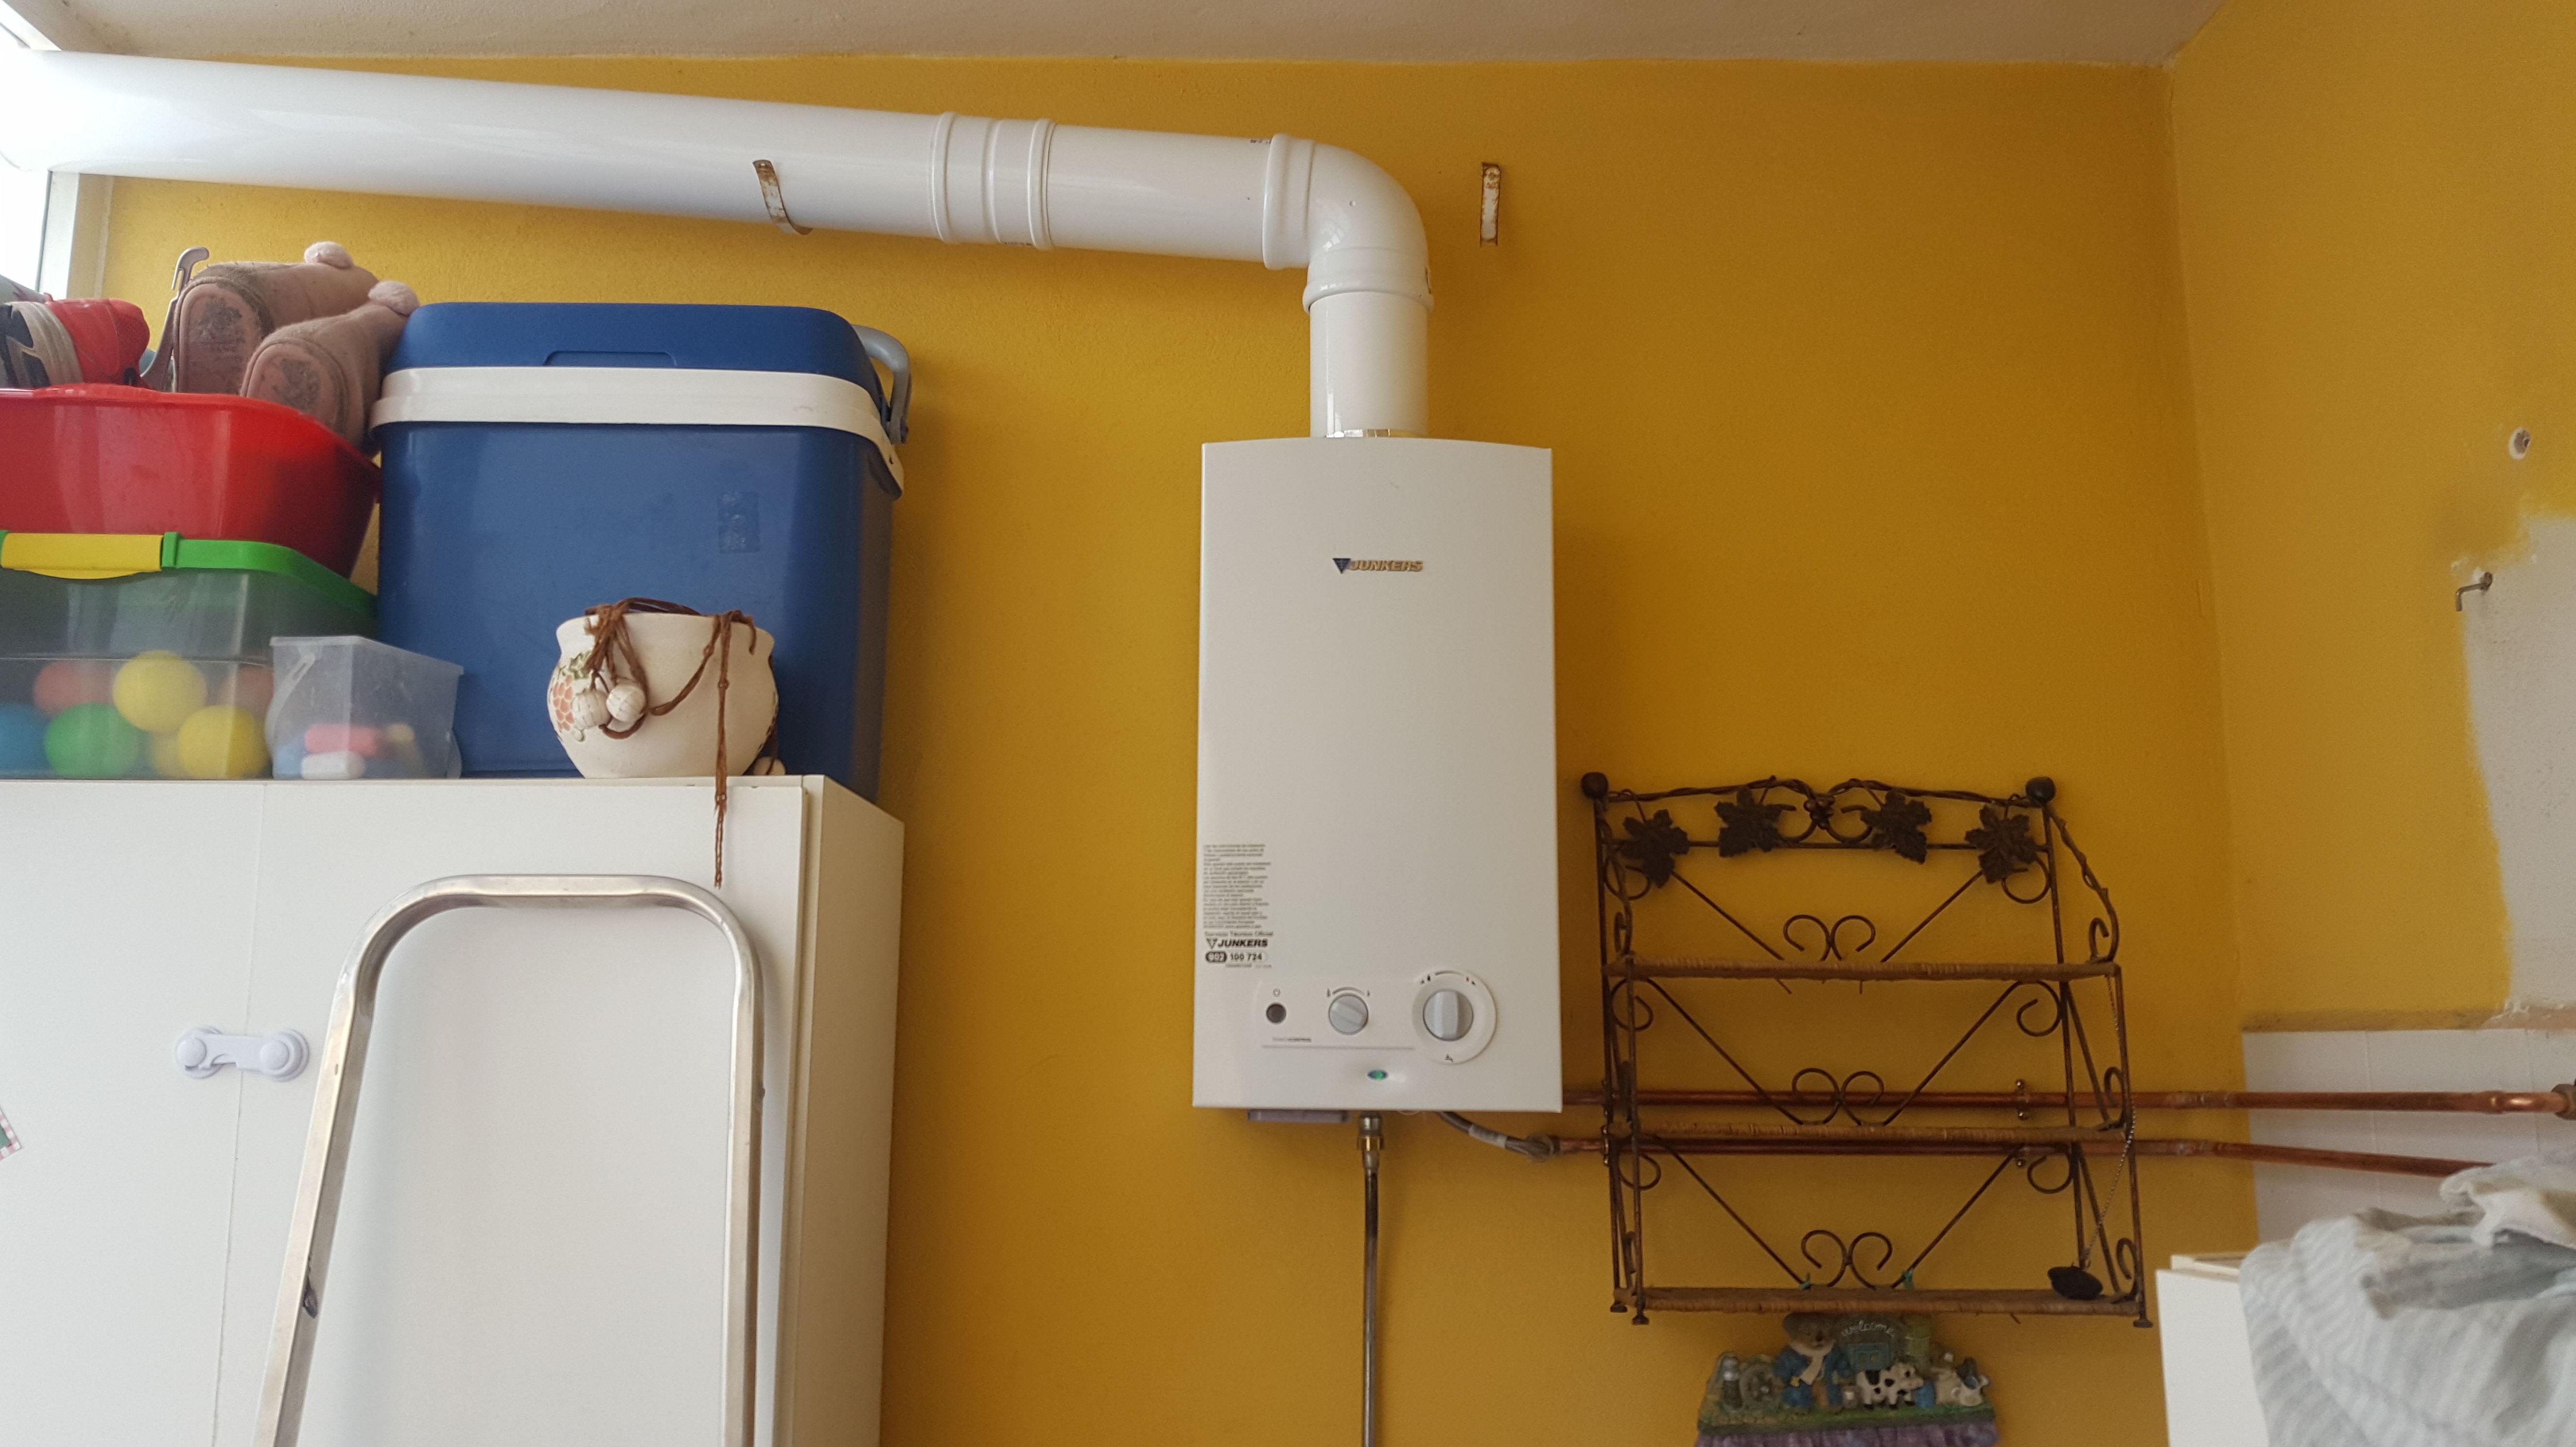 Instalacion de calentador a gas en Aguadulce